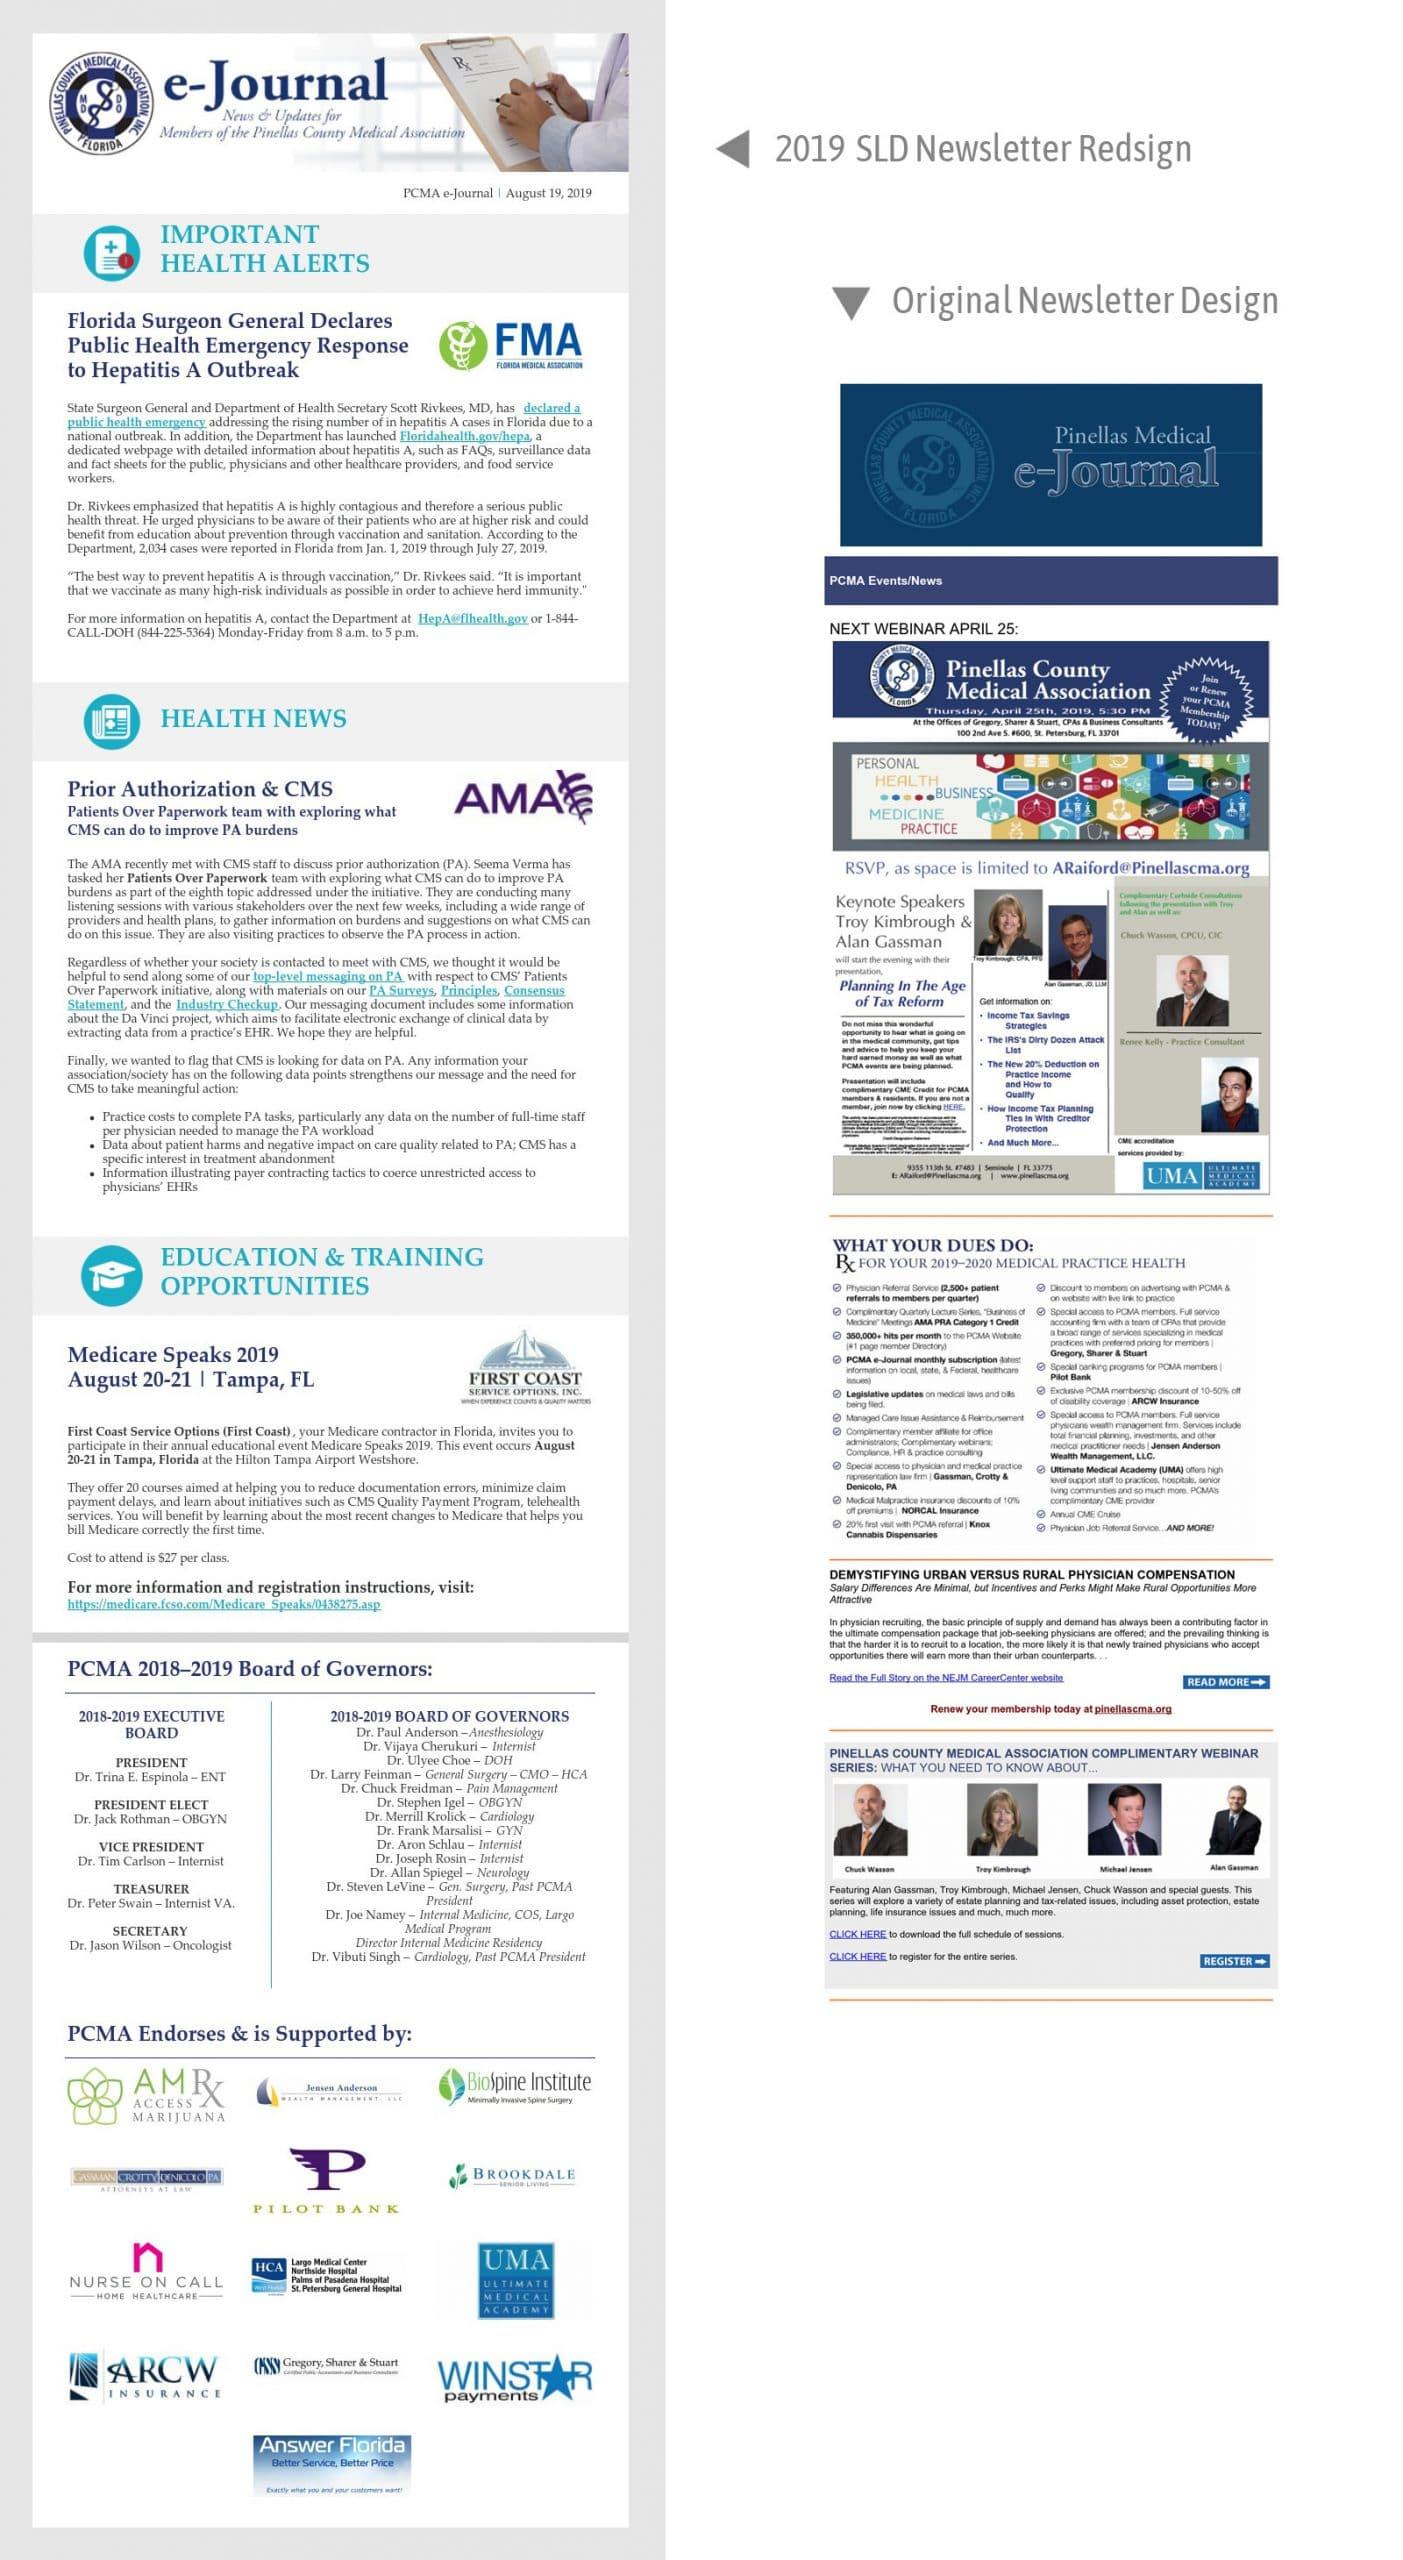 PCMA Newsletter Redesign